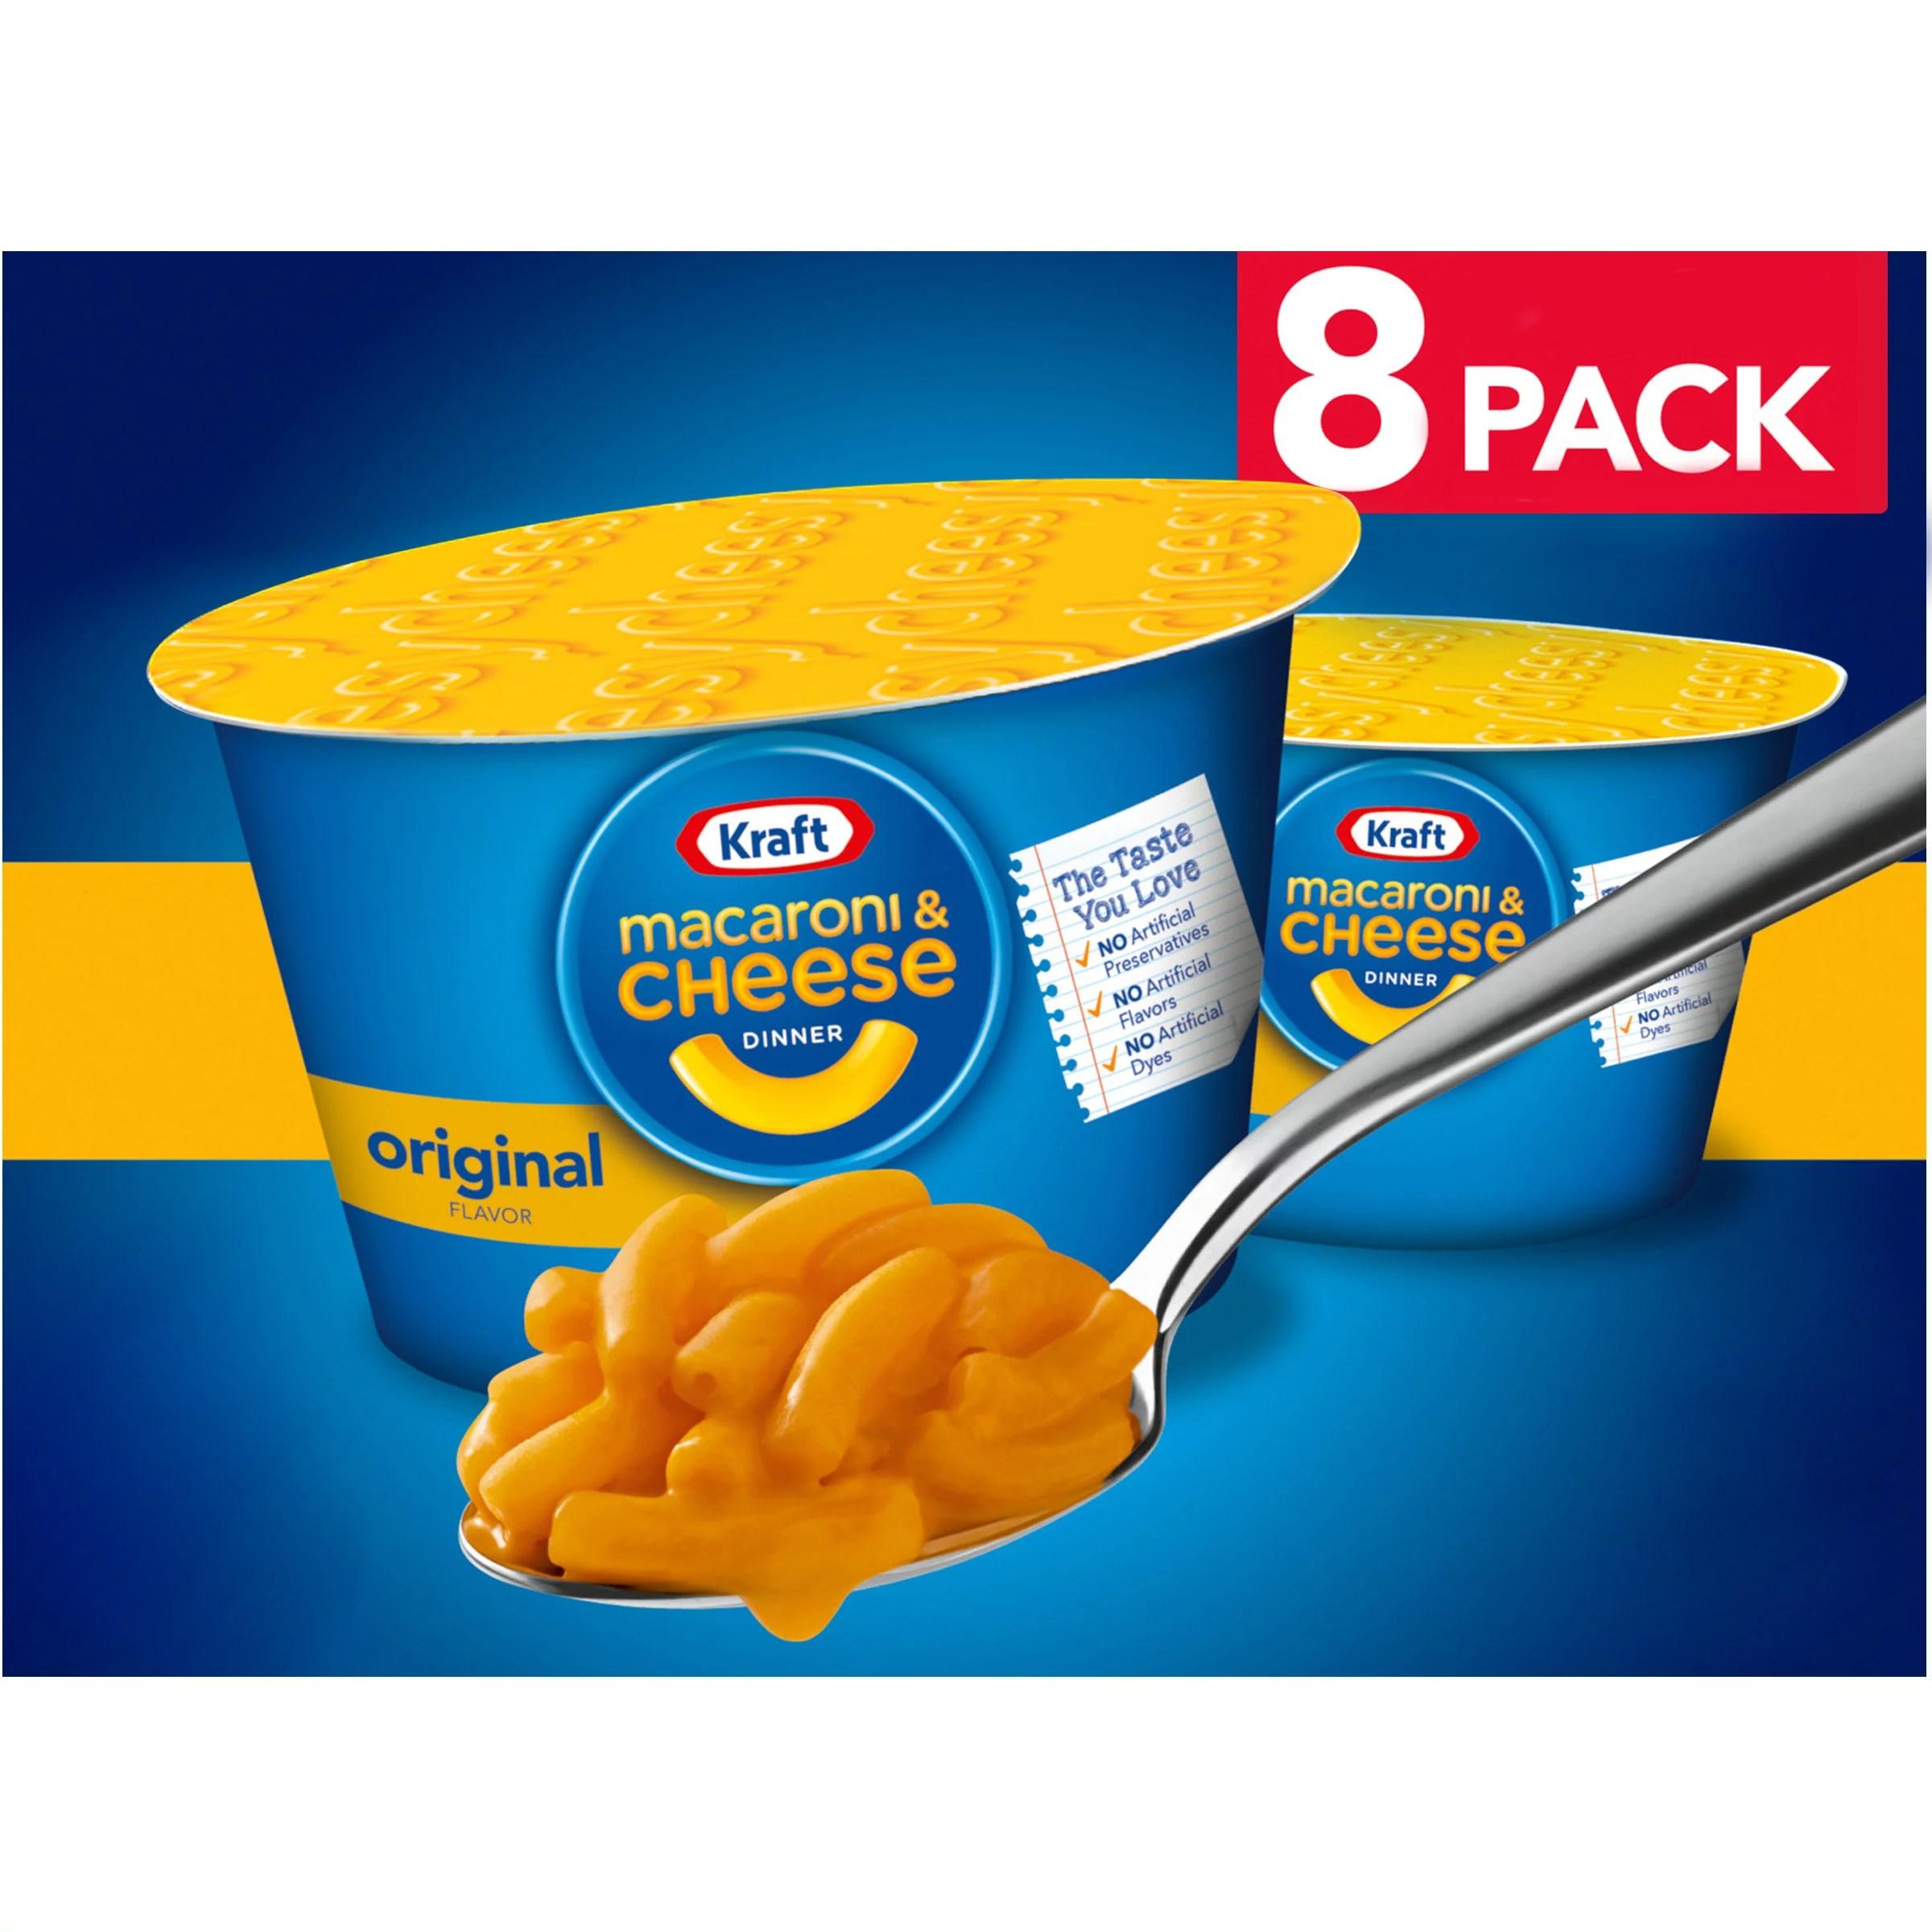 kraft original macaroni cheese easy microwavable dinner 8 ct box 2 05 oz cups walmart com